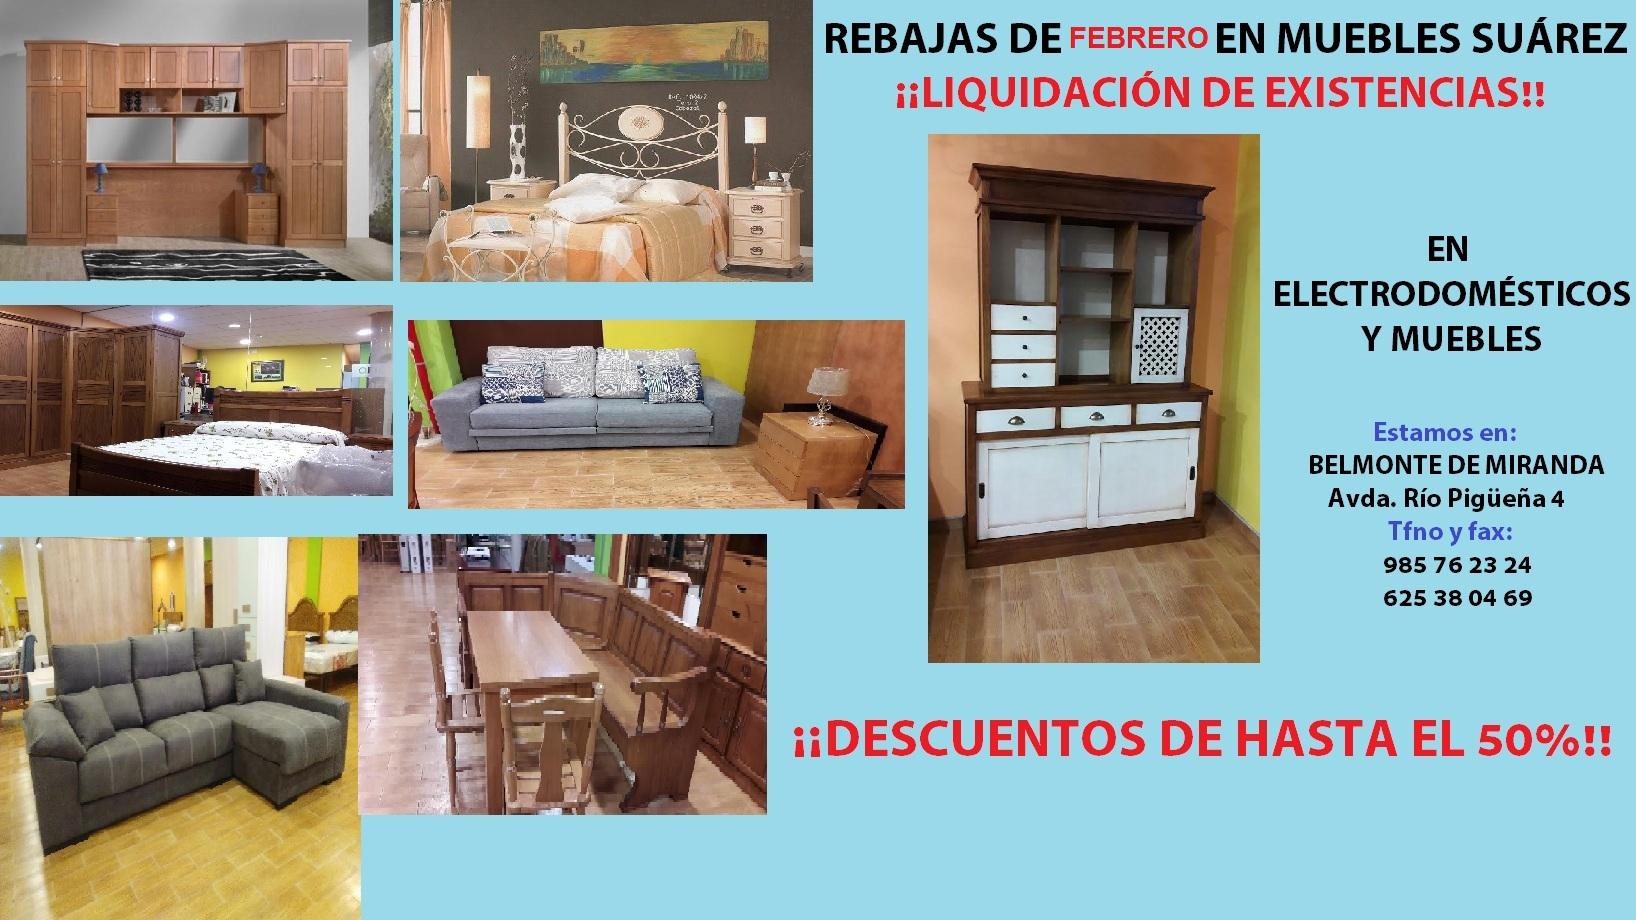 Muebles Suarez Belmonte De Miranda - Josefina Somiedo Diario Digital Del Cam N Real De La Mesa[mjhdah]http://interioresminimalistas.com/wp-content/uploads/2016/08/santos-docrys-diseno-interior-vivienda-10.jpg